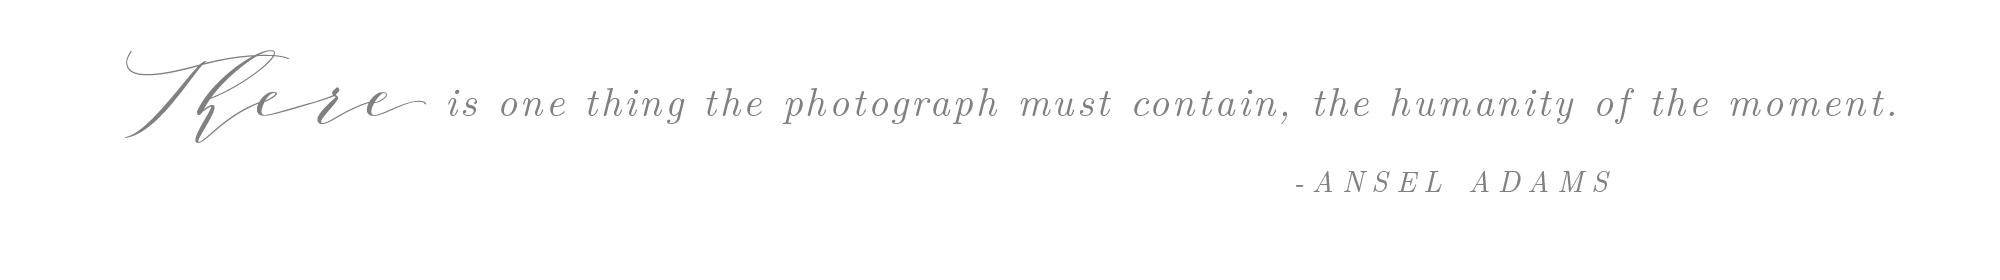 ansel-adams-quote.jpg